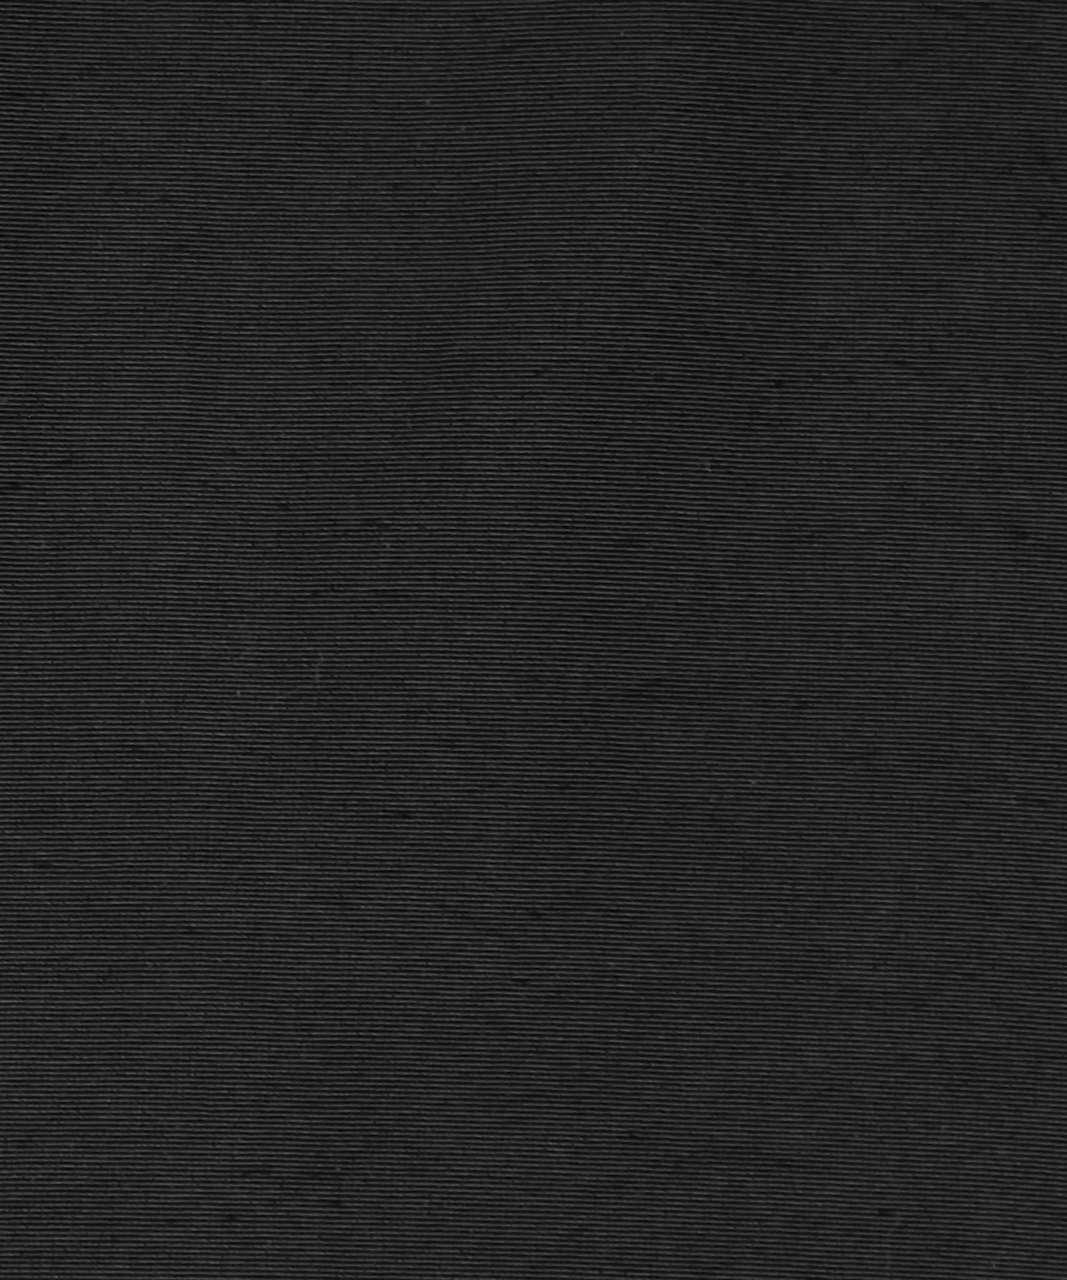 Lululemon Always Effortless Jacket - Black